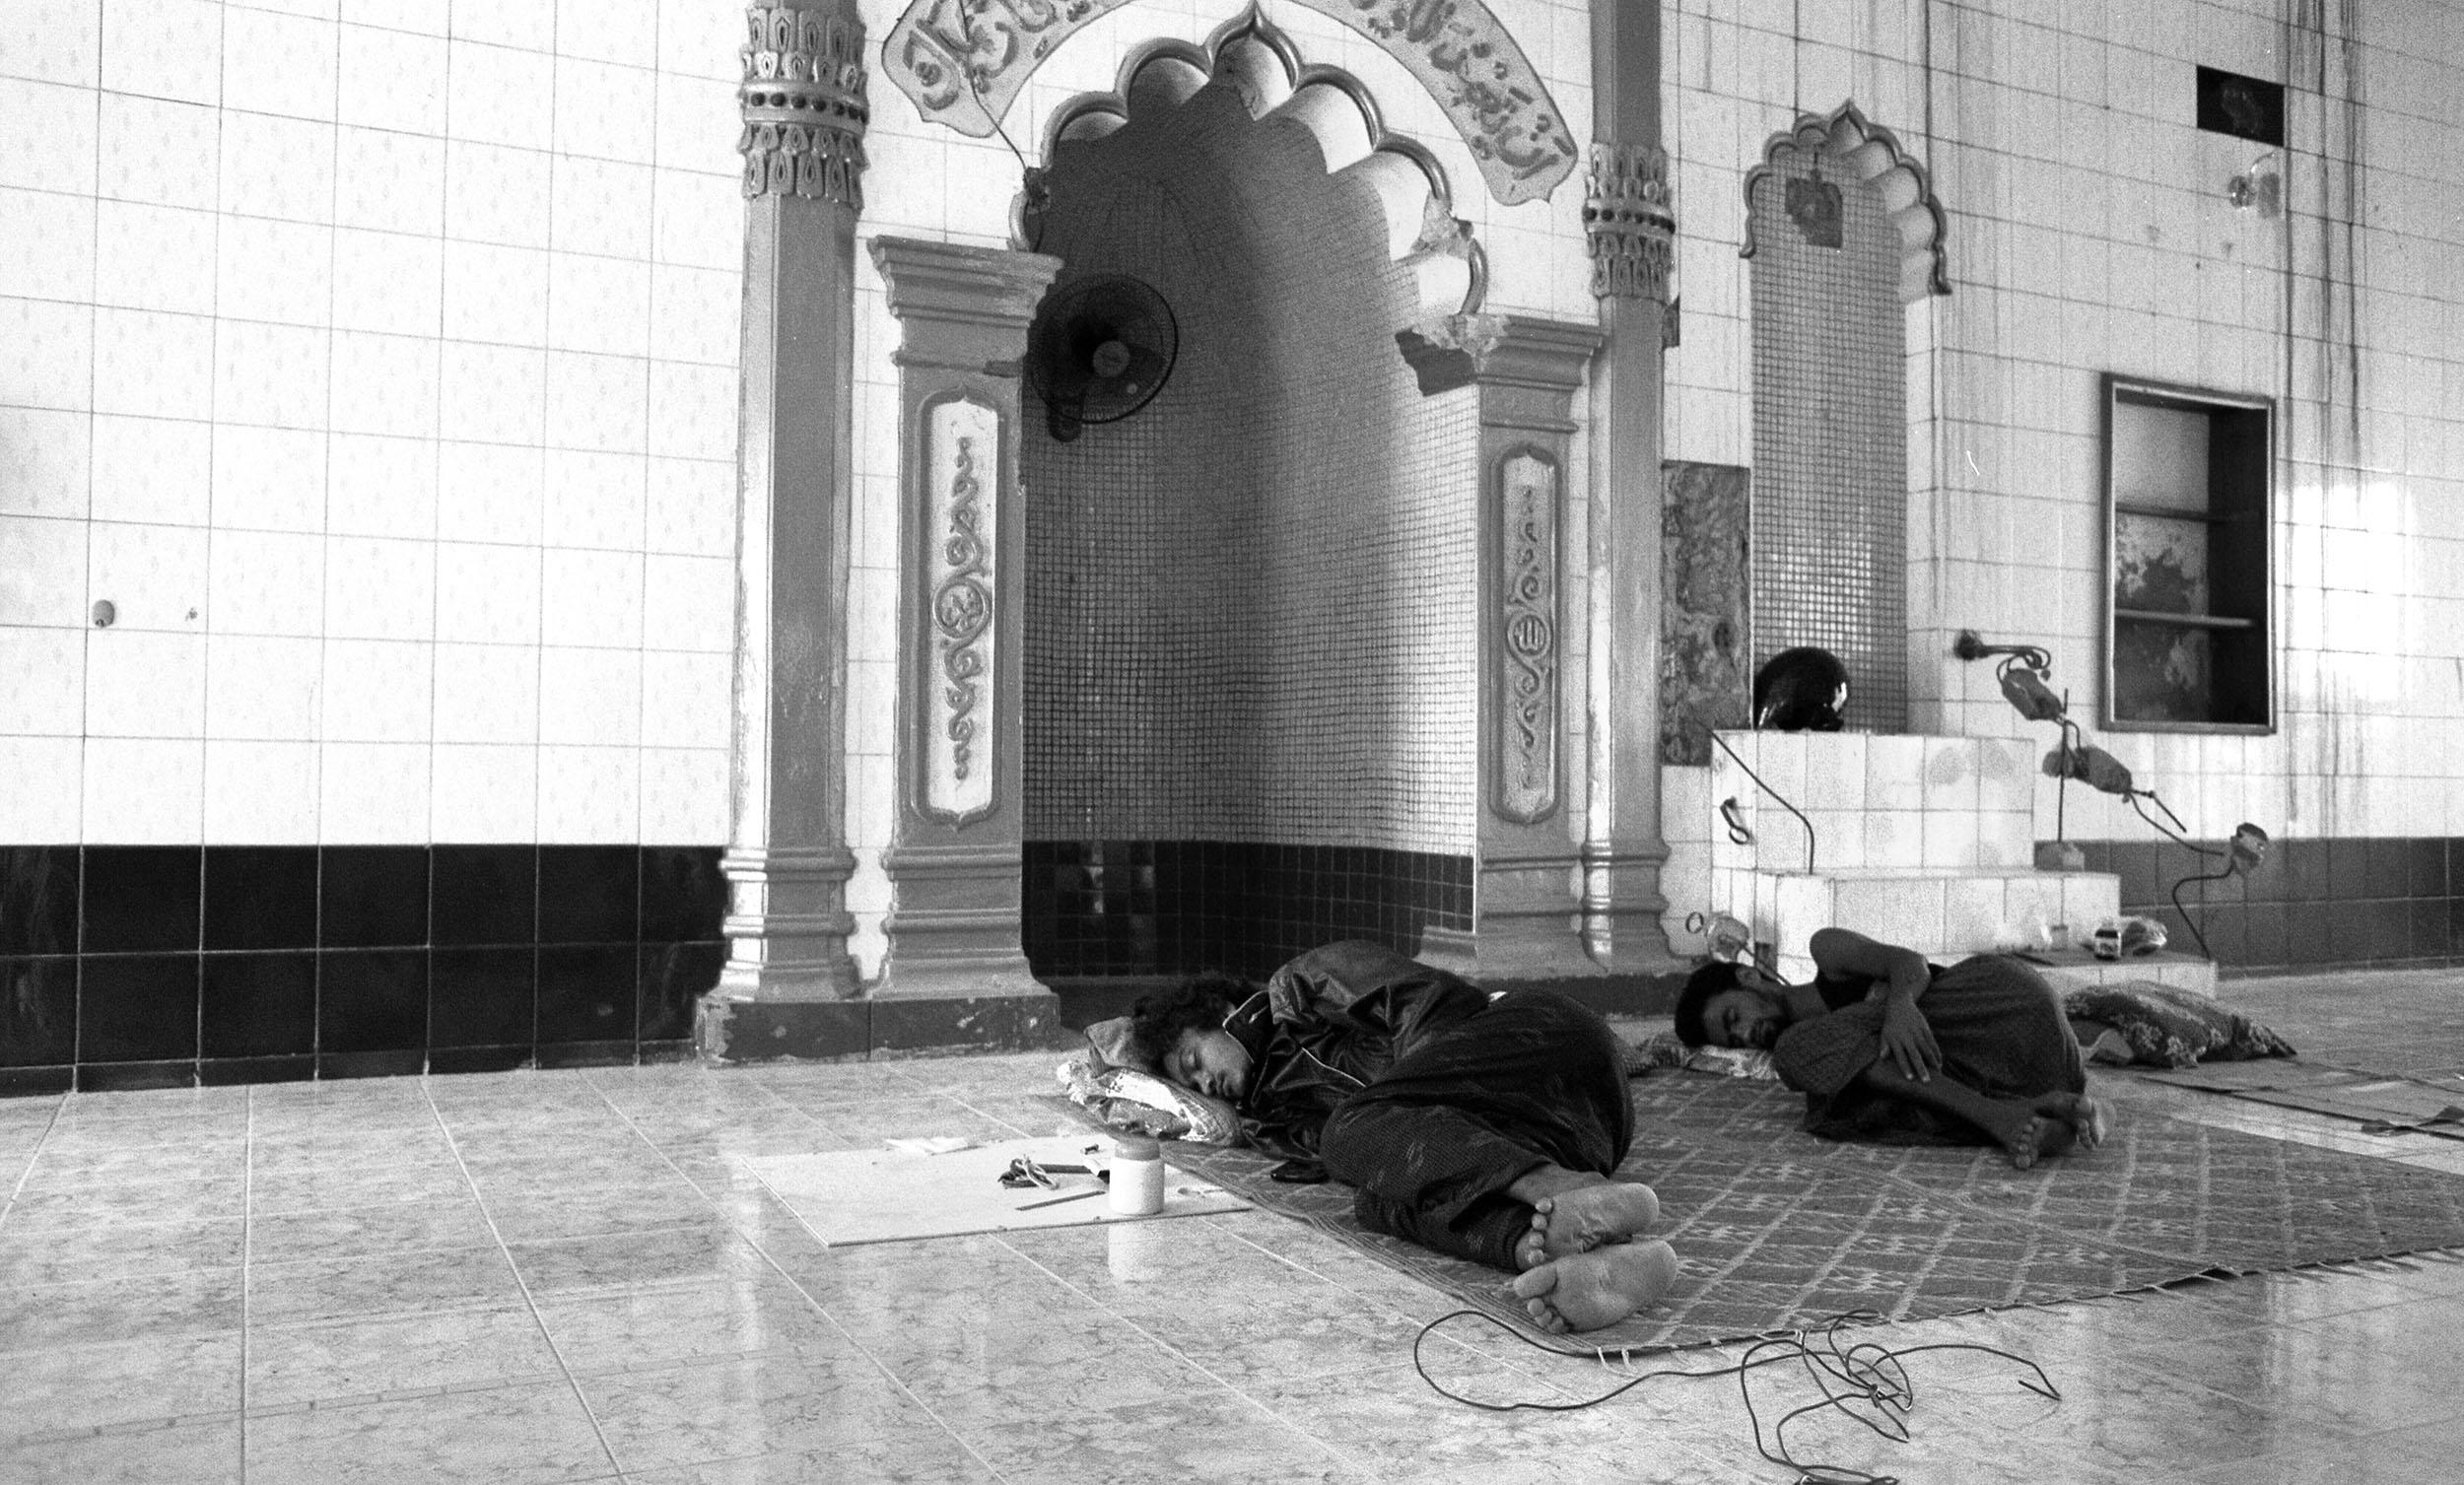 Meiktila. Muslim men rest while rebuilding their Mosque after it was damaged in fighting.